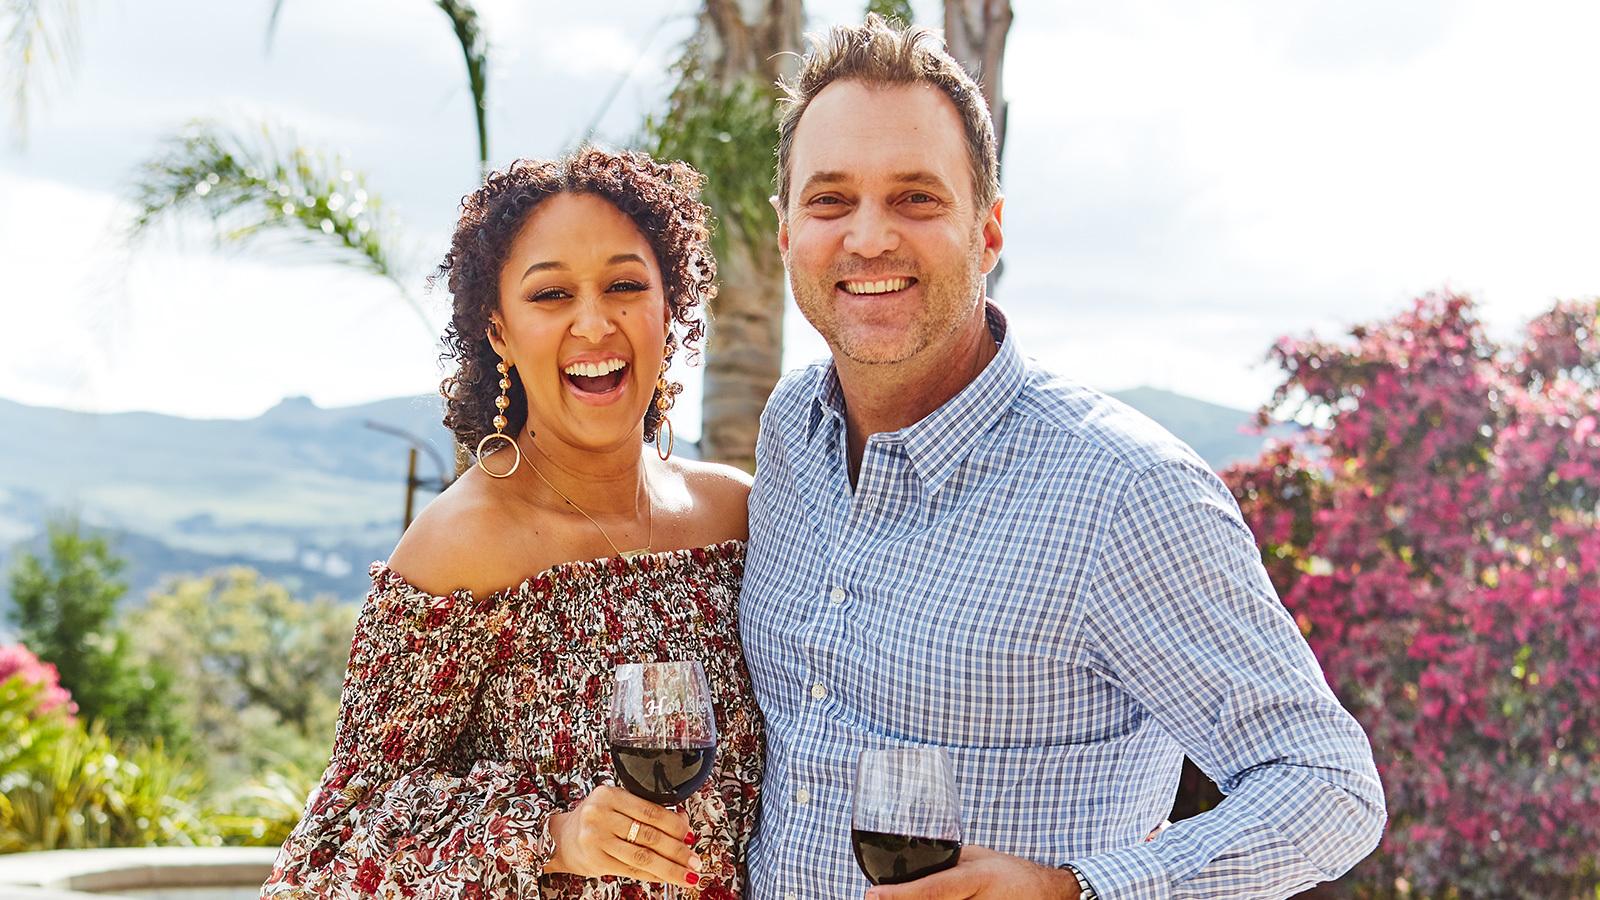 Wine & Design: Tamera Mowry-housley And Adam Housley At Home photo